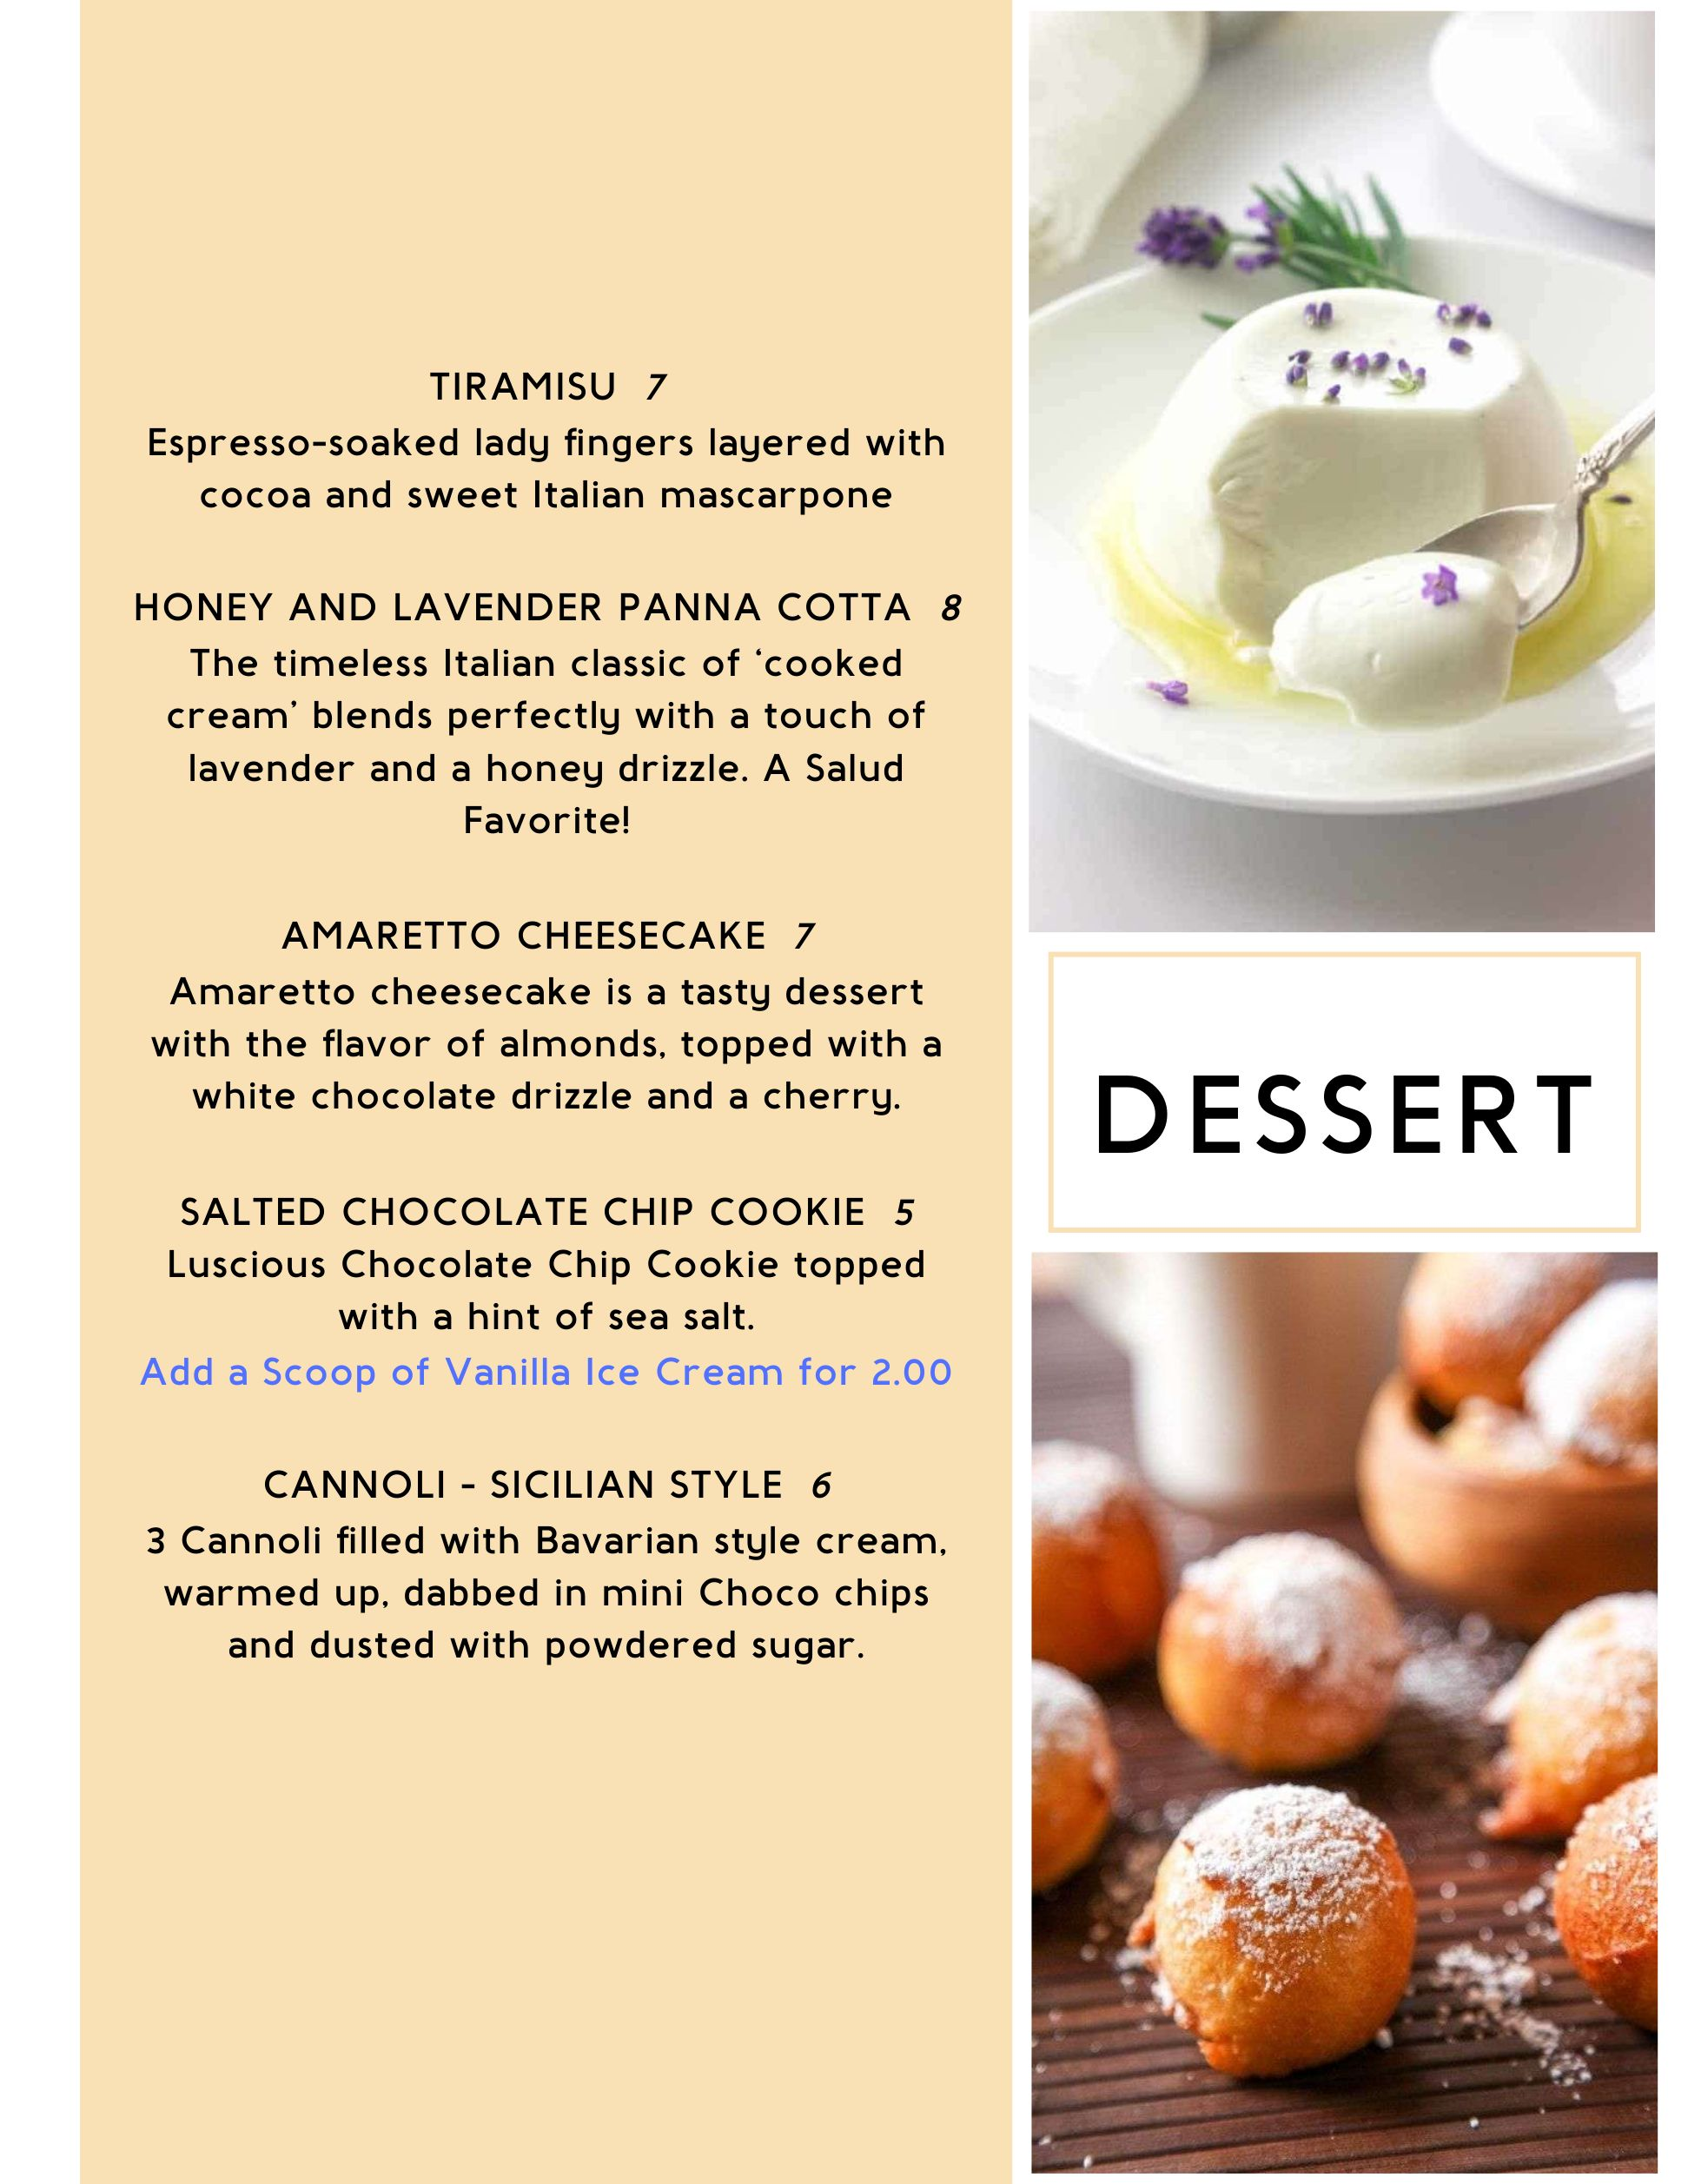 To Go Dessert